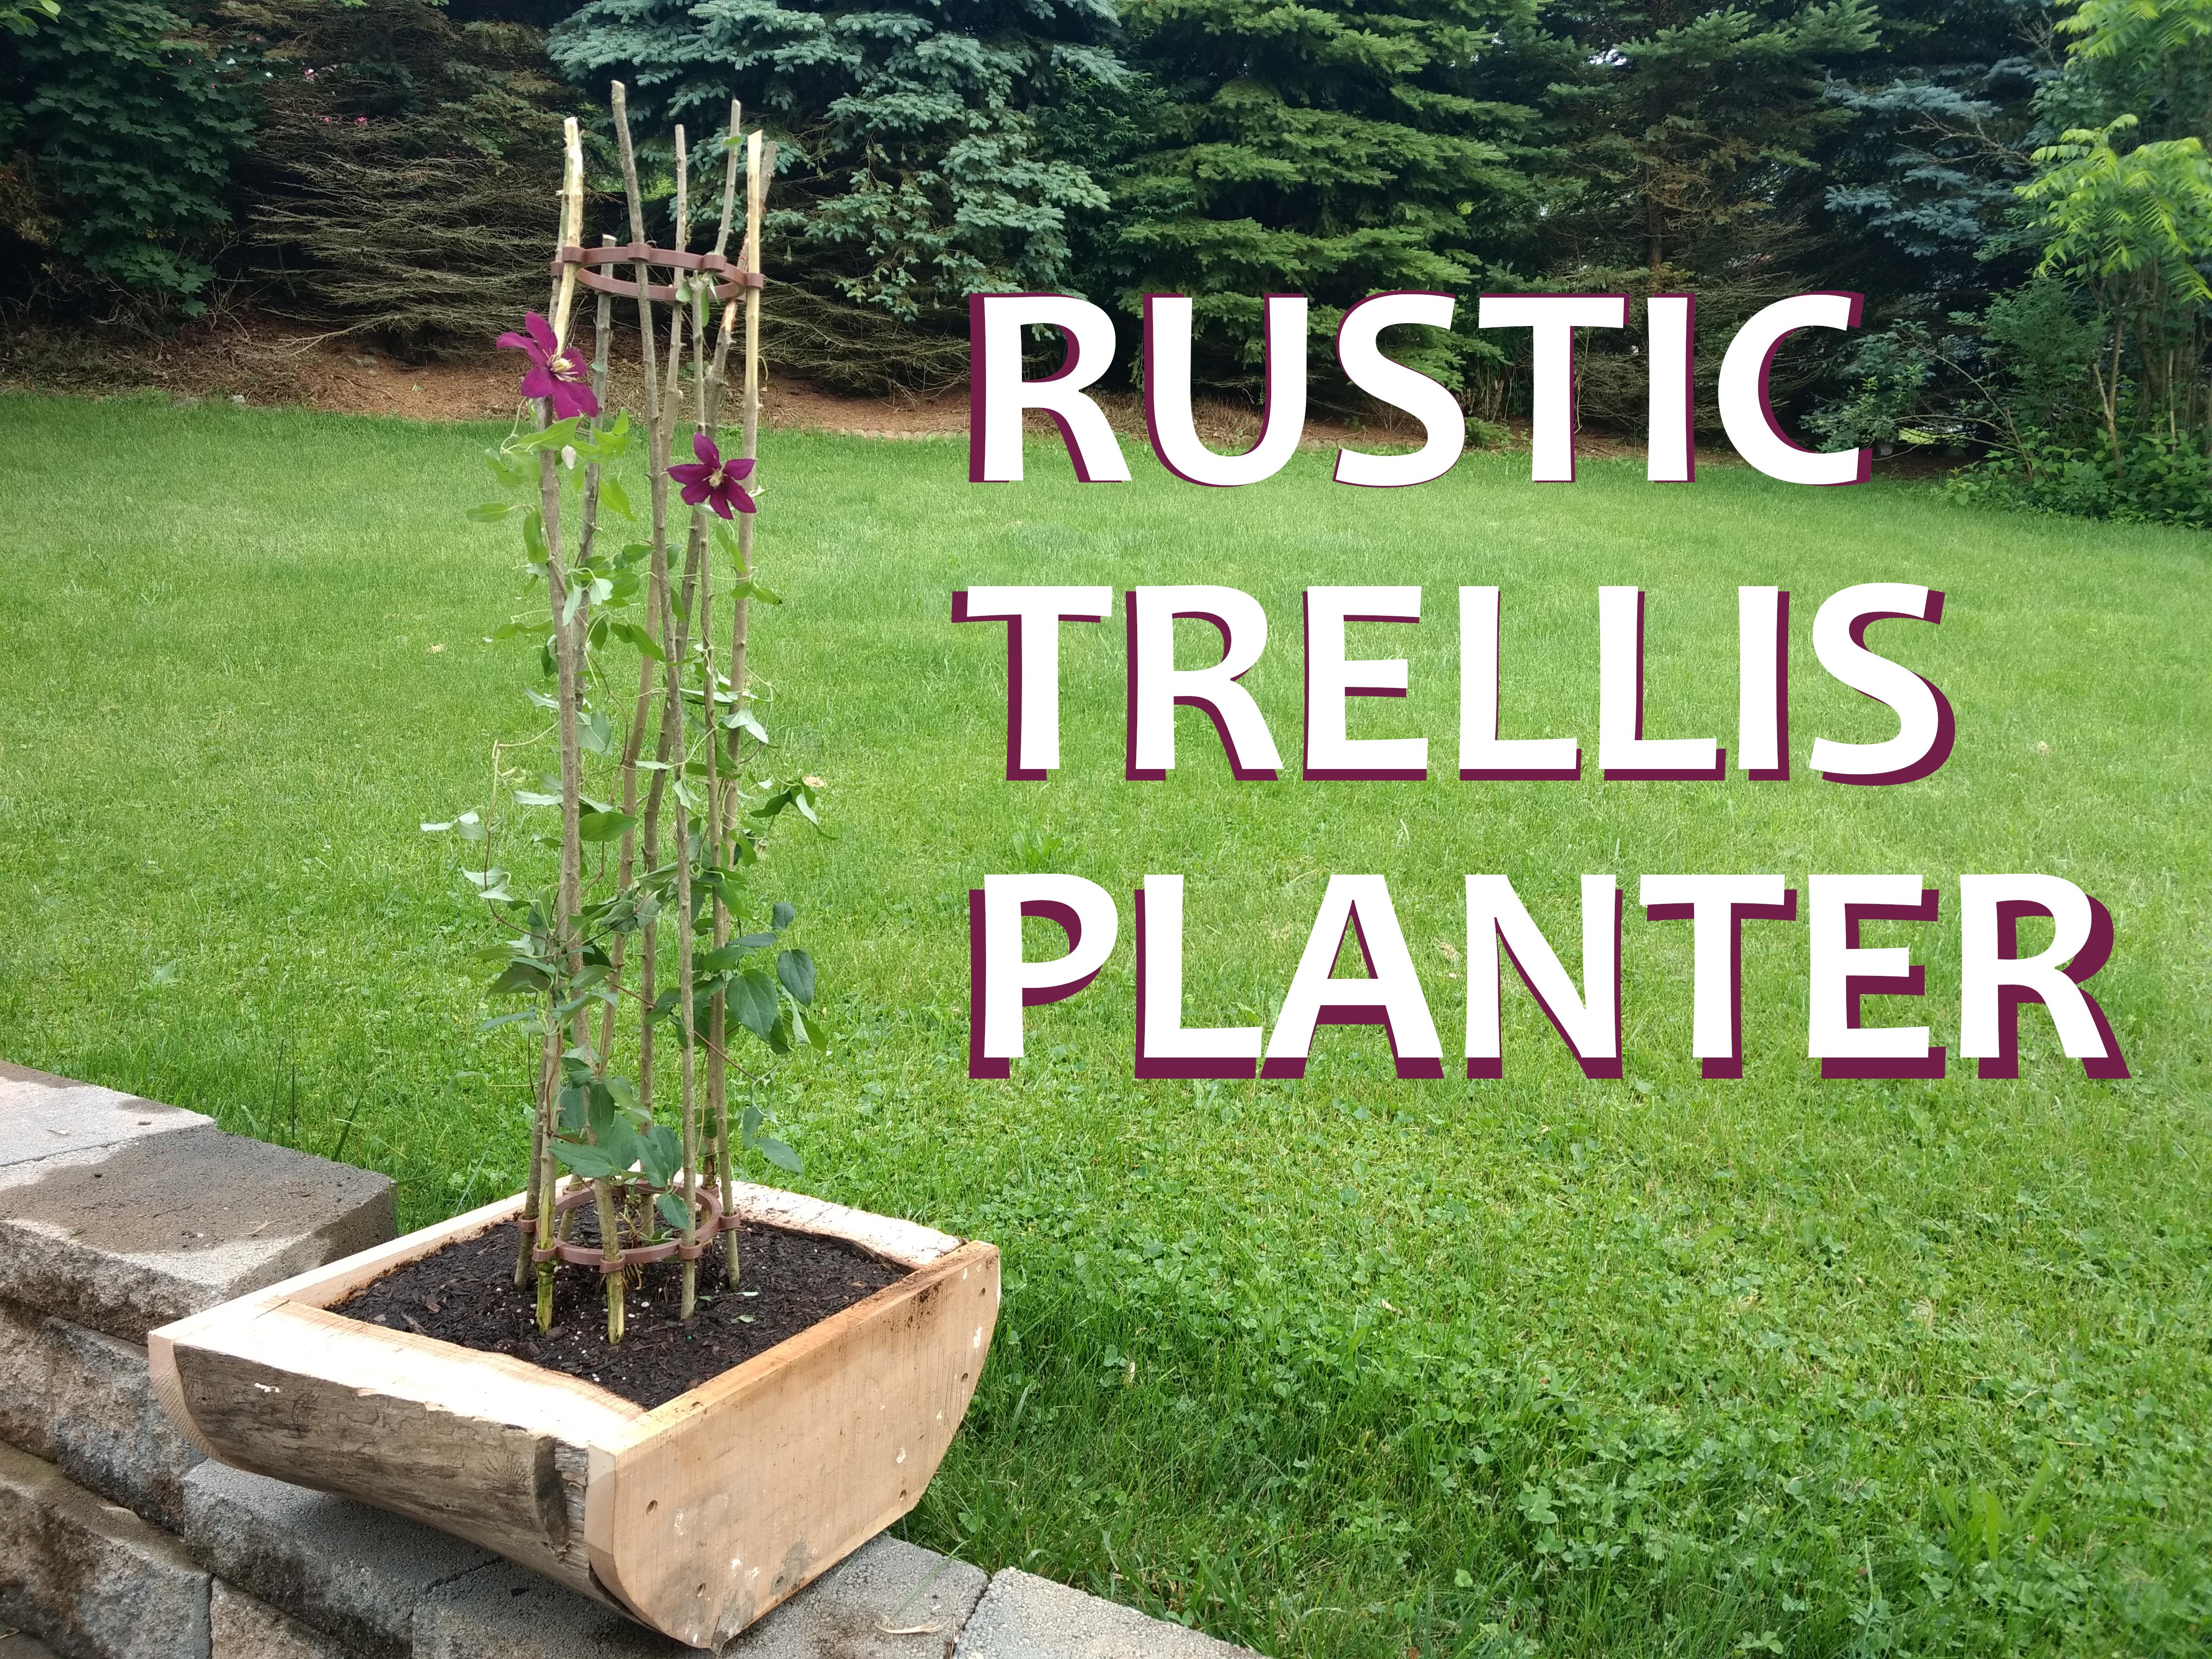 Picture of The Rustic Trellis Planter